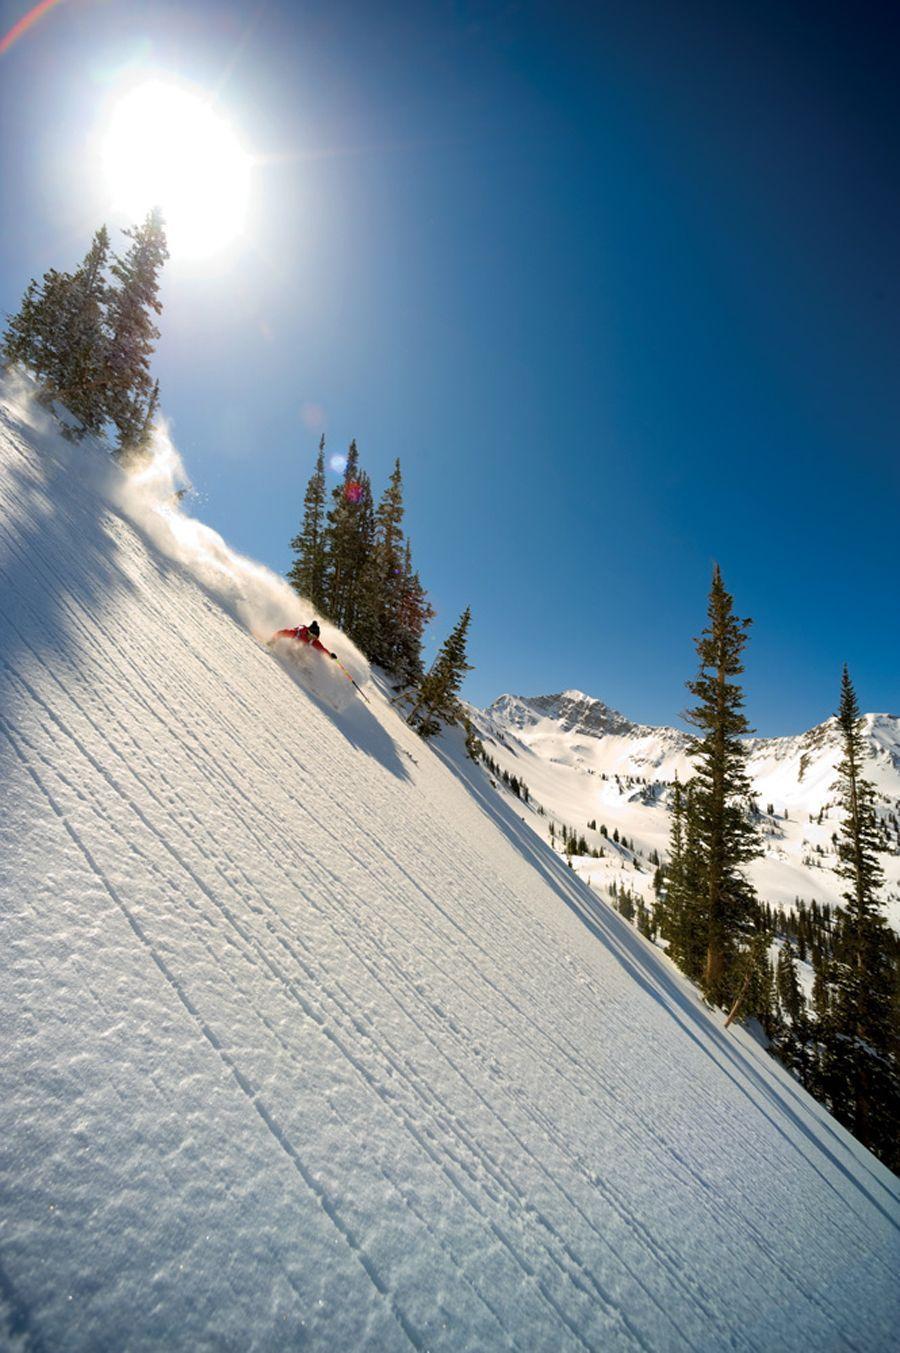 Buy warm ski socks Ski resort, Skiing, Best ski resorts